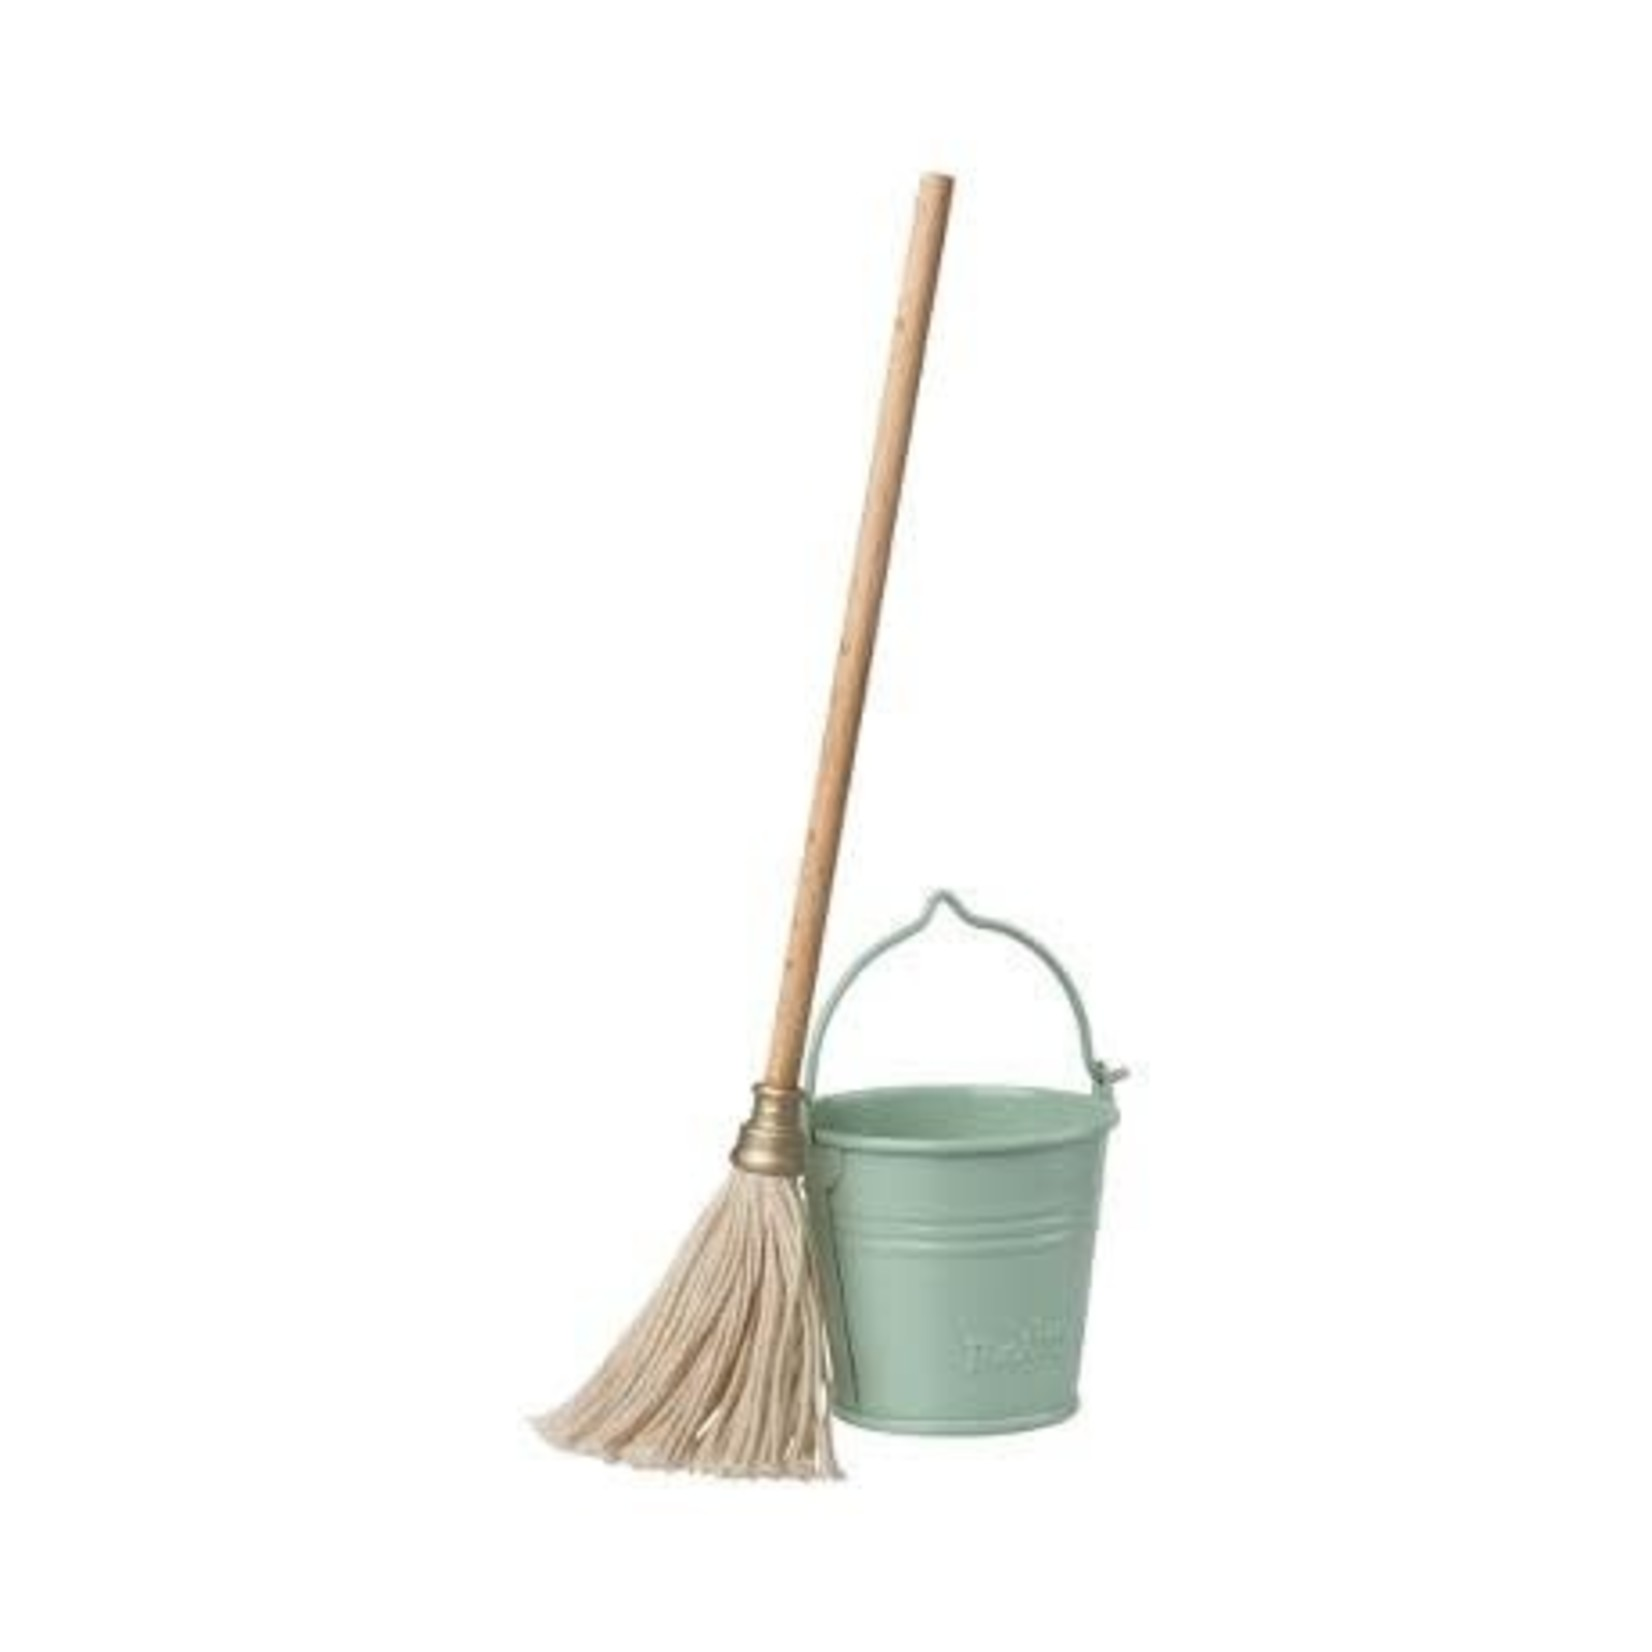 Maileg Bucket & Mop - Maileg